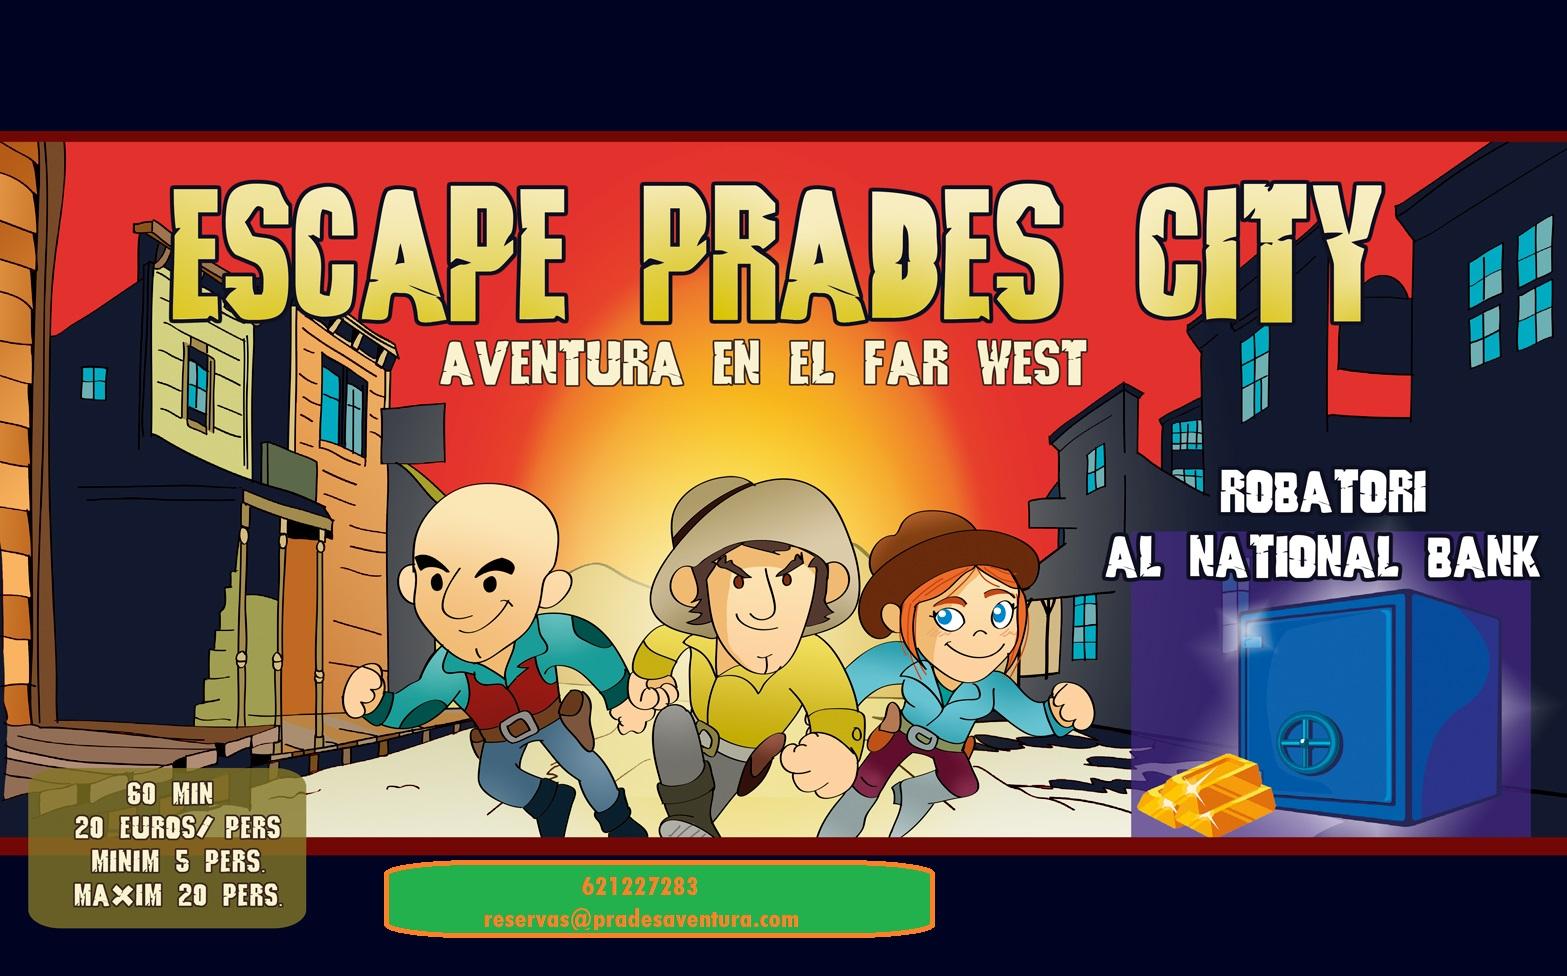 escapePradesCityQ